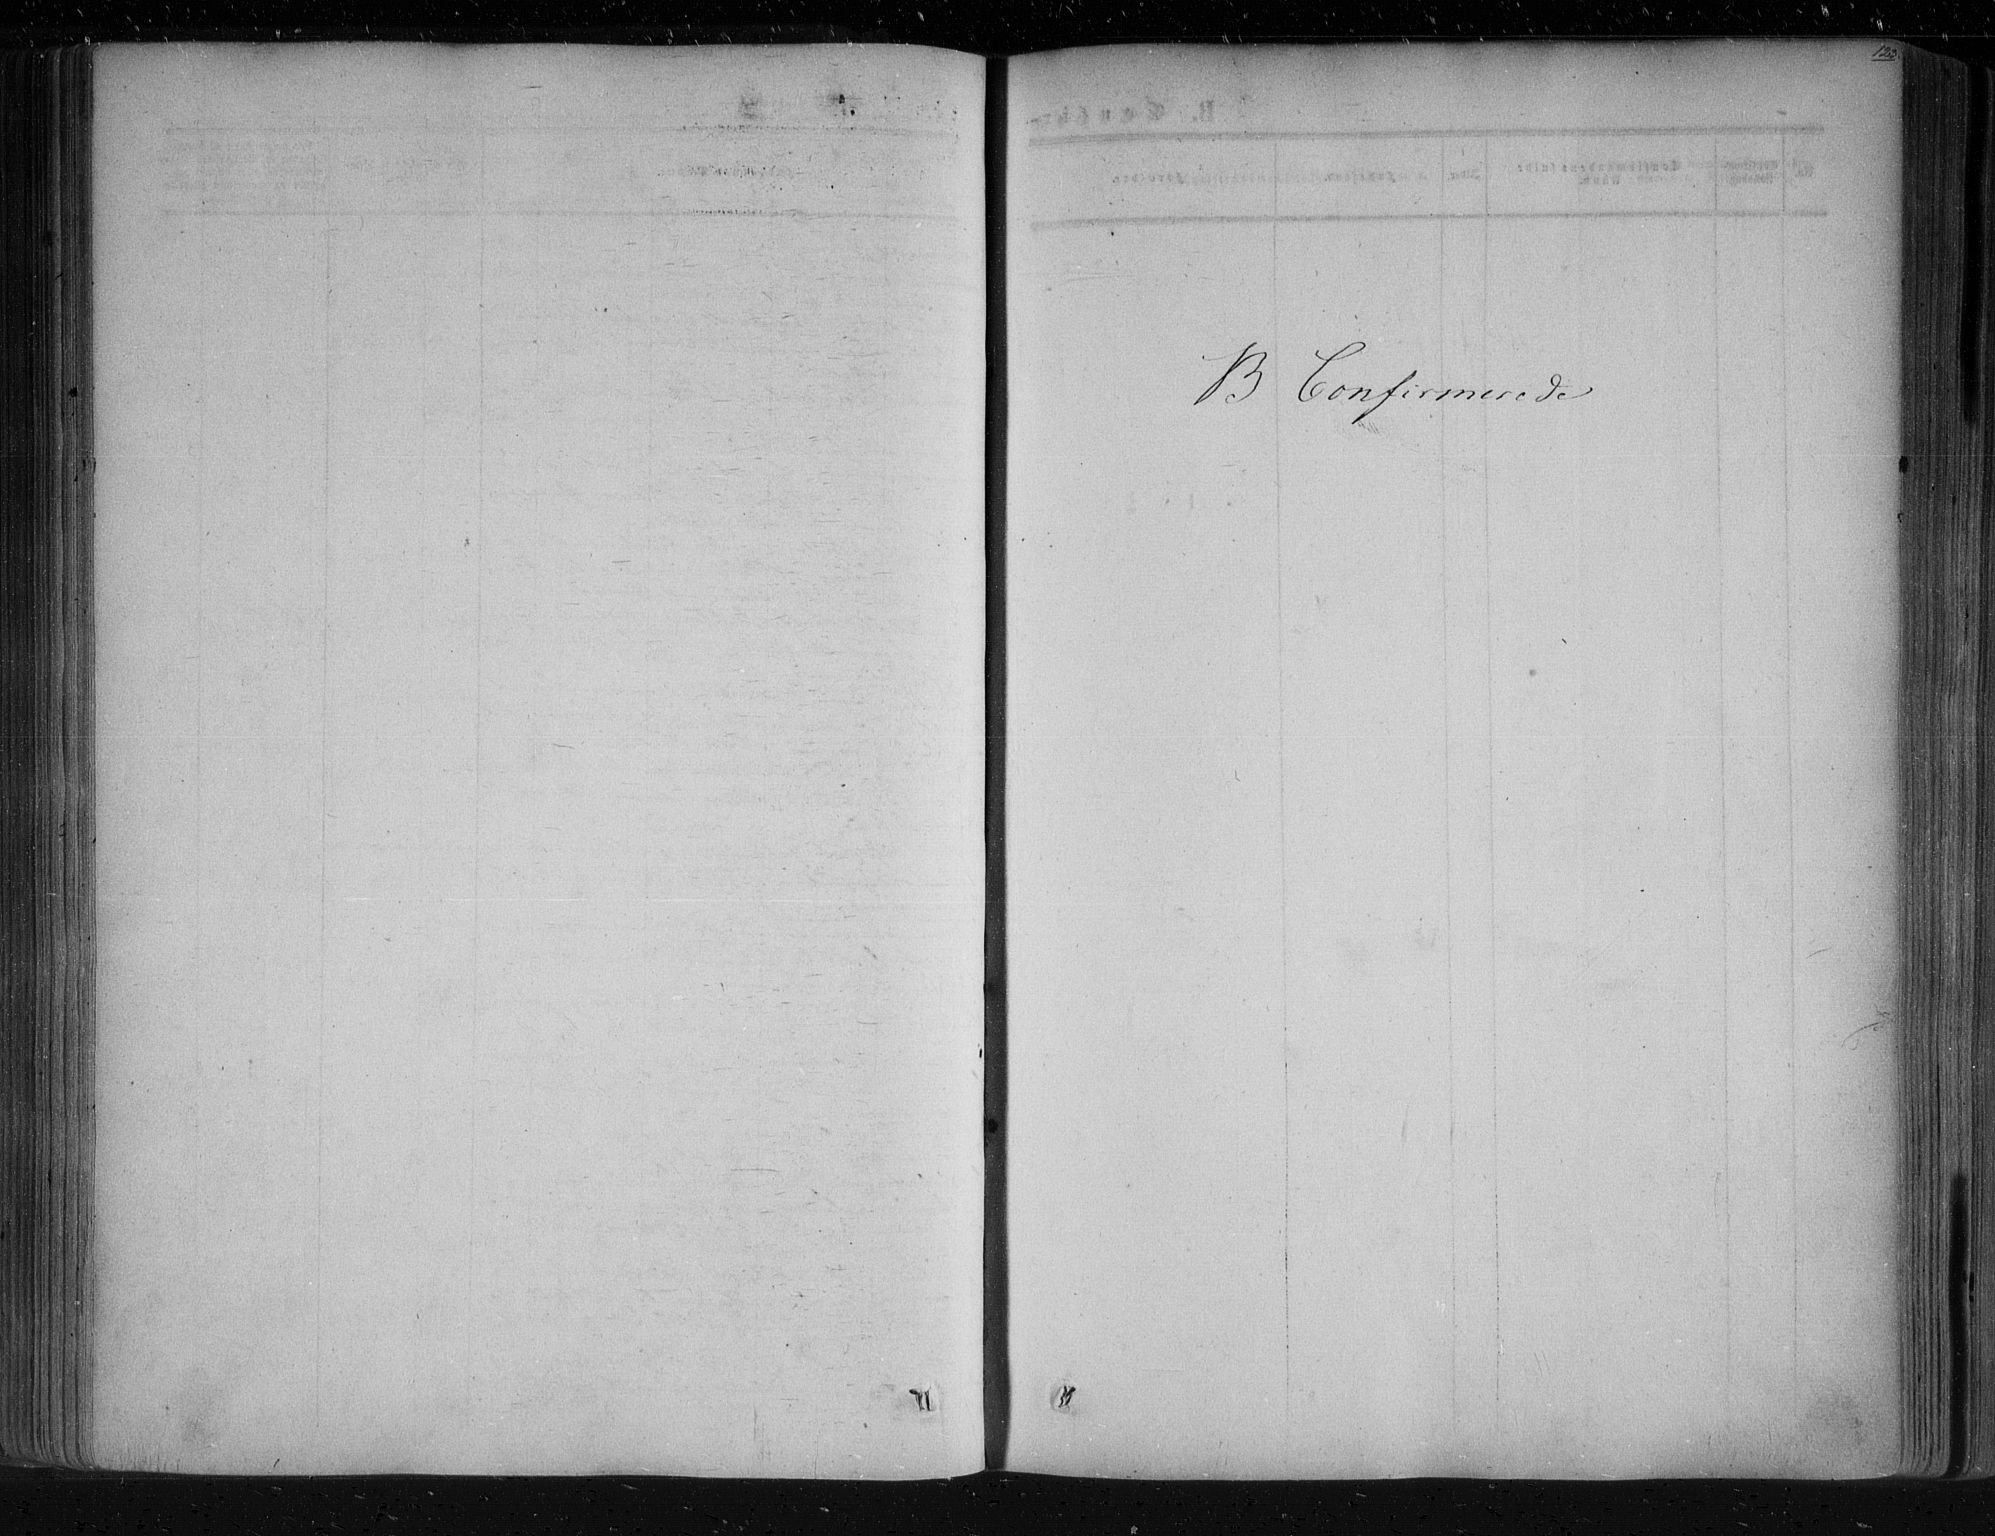 SAO, Aremark prestekontor Kirkebøker, F/Fc/L0003: Ministerialbok nr. III 3, 1850-1865, s. 123